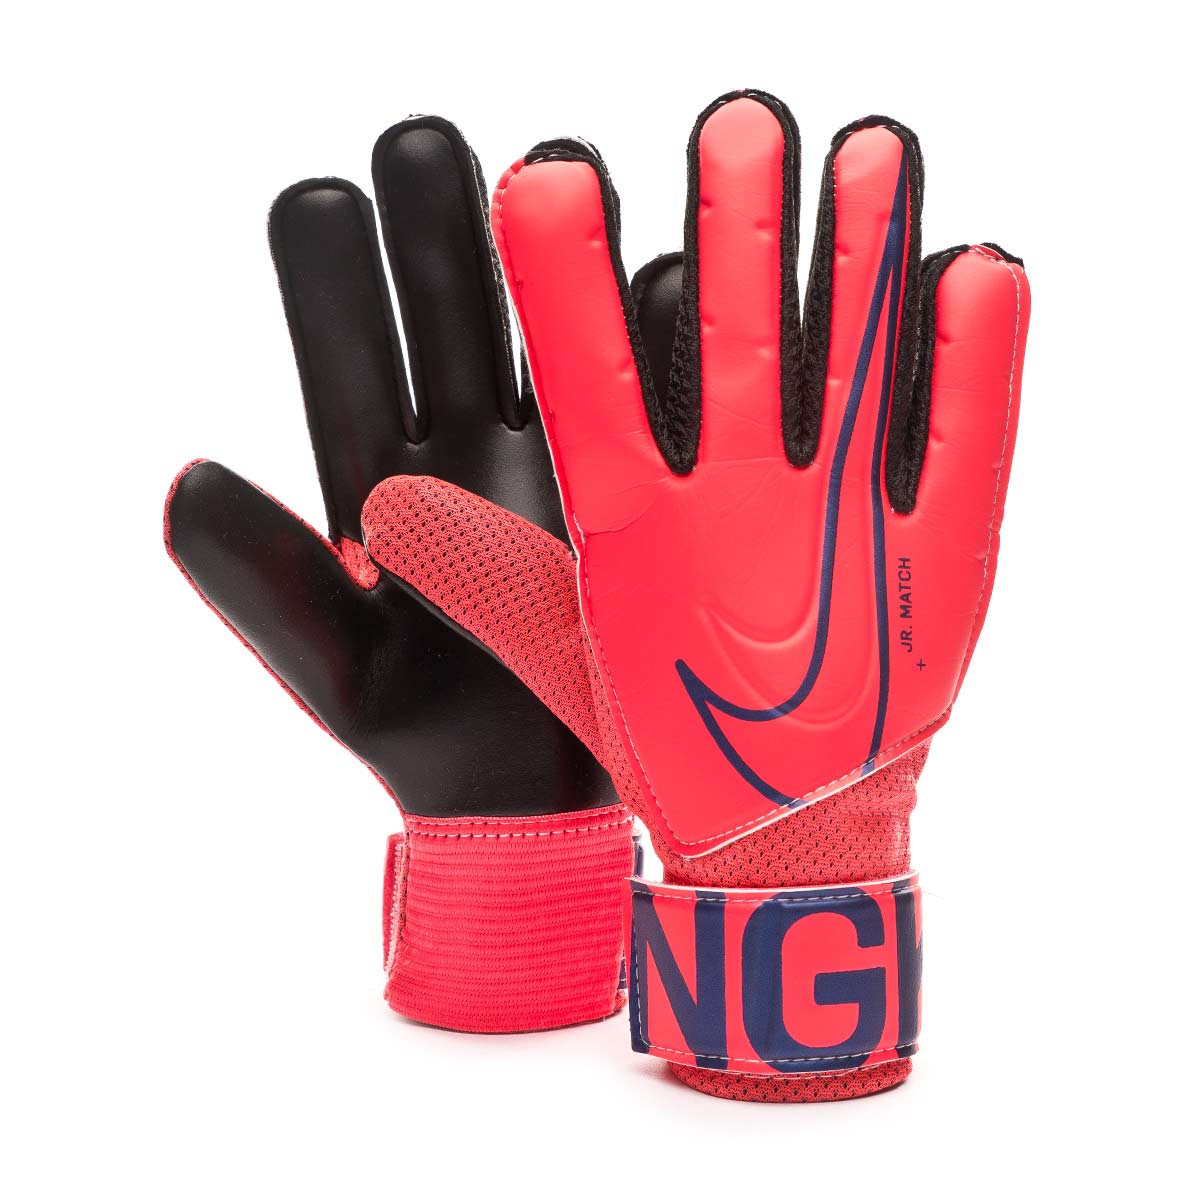 salir Dos grados contar  Glove Nike Match Niño Laser crimson-Black - Football store Fútbol Emotion